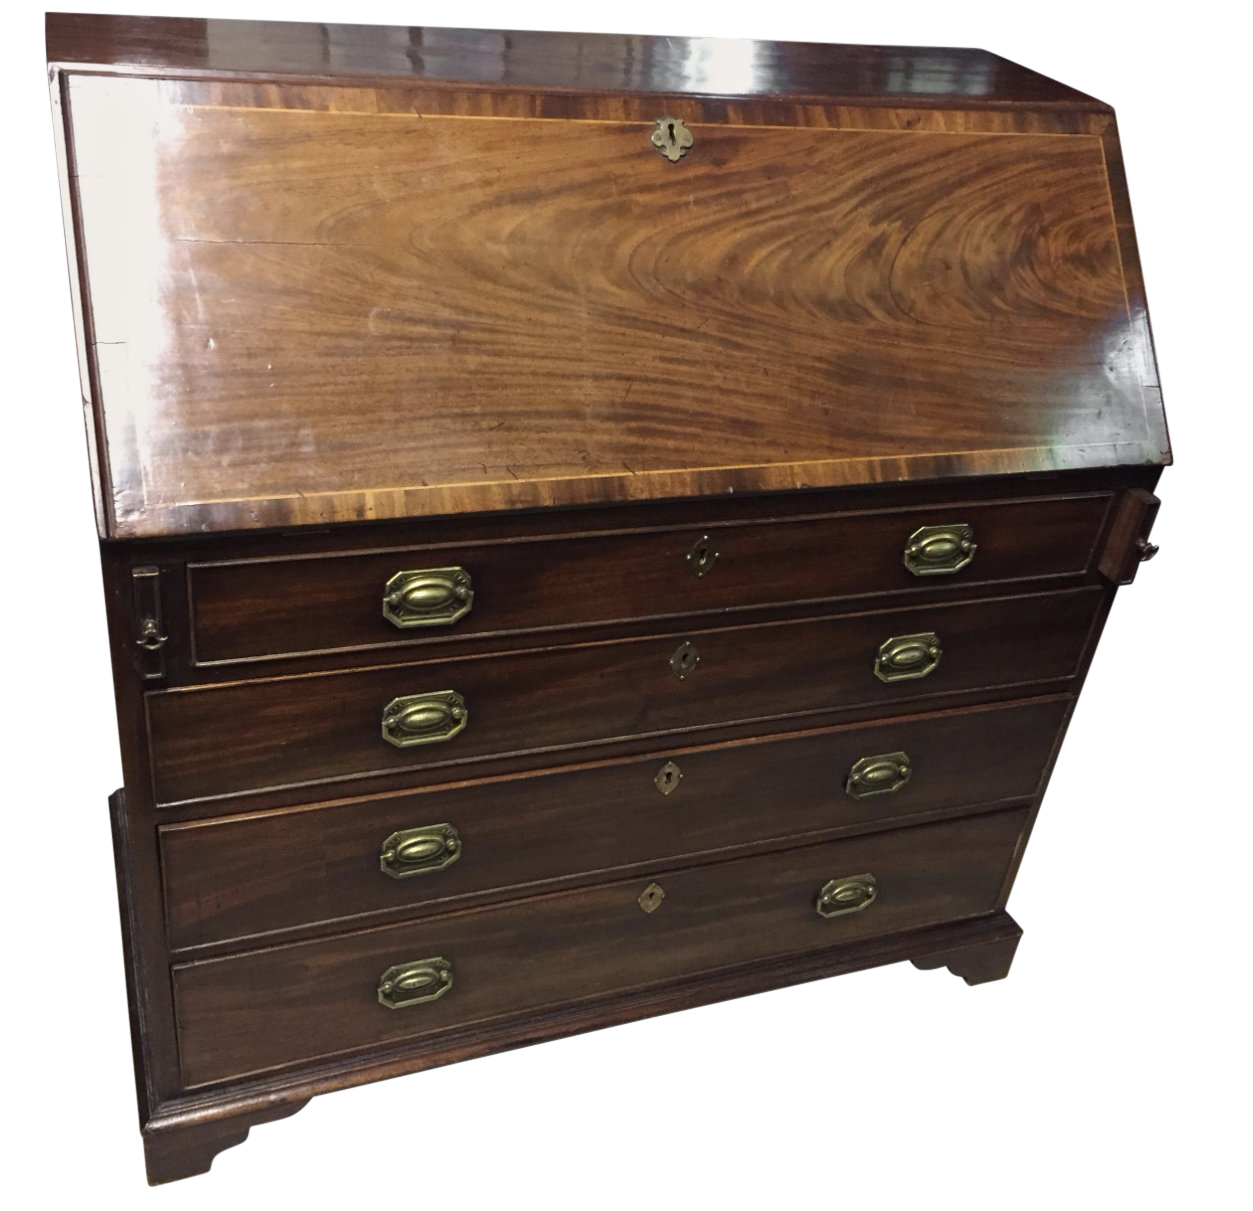 bureau english 19th Century English Bureau Desk With Inlay For Sale